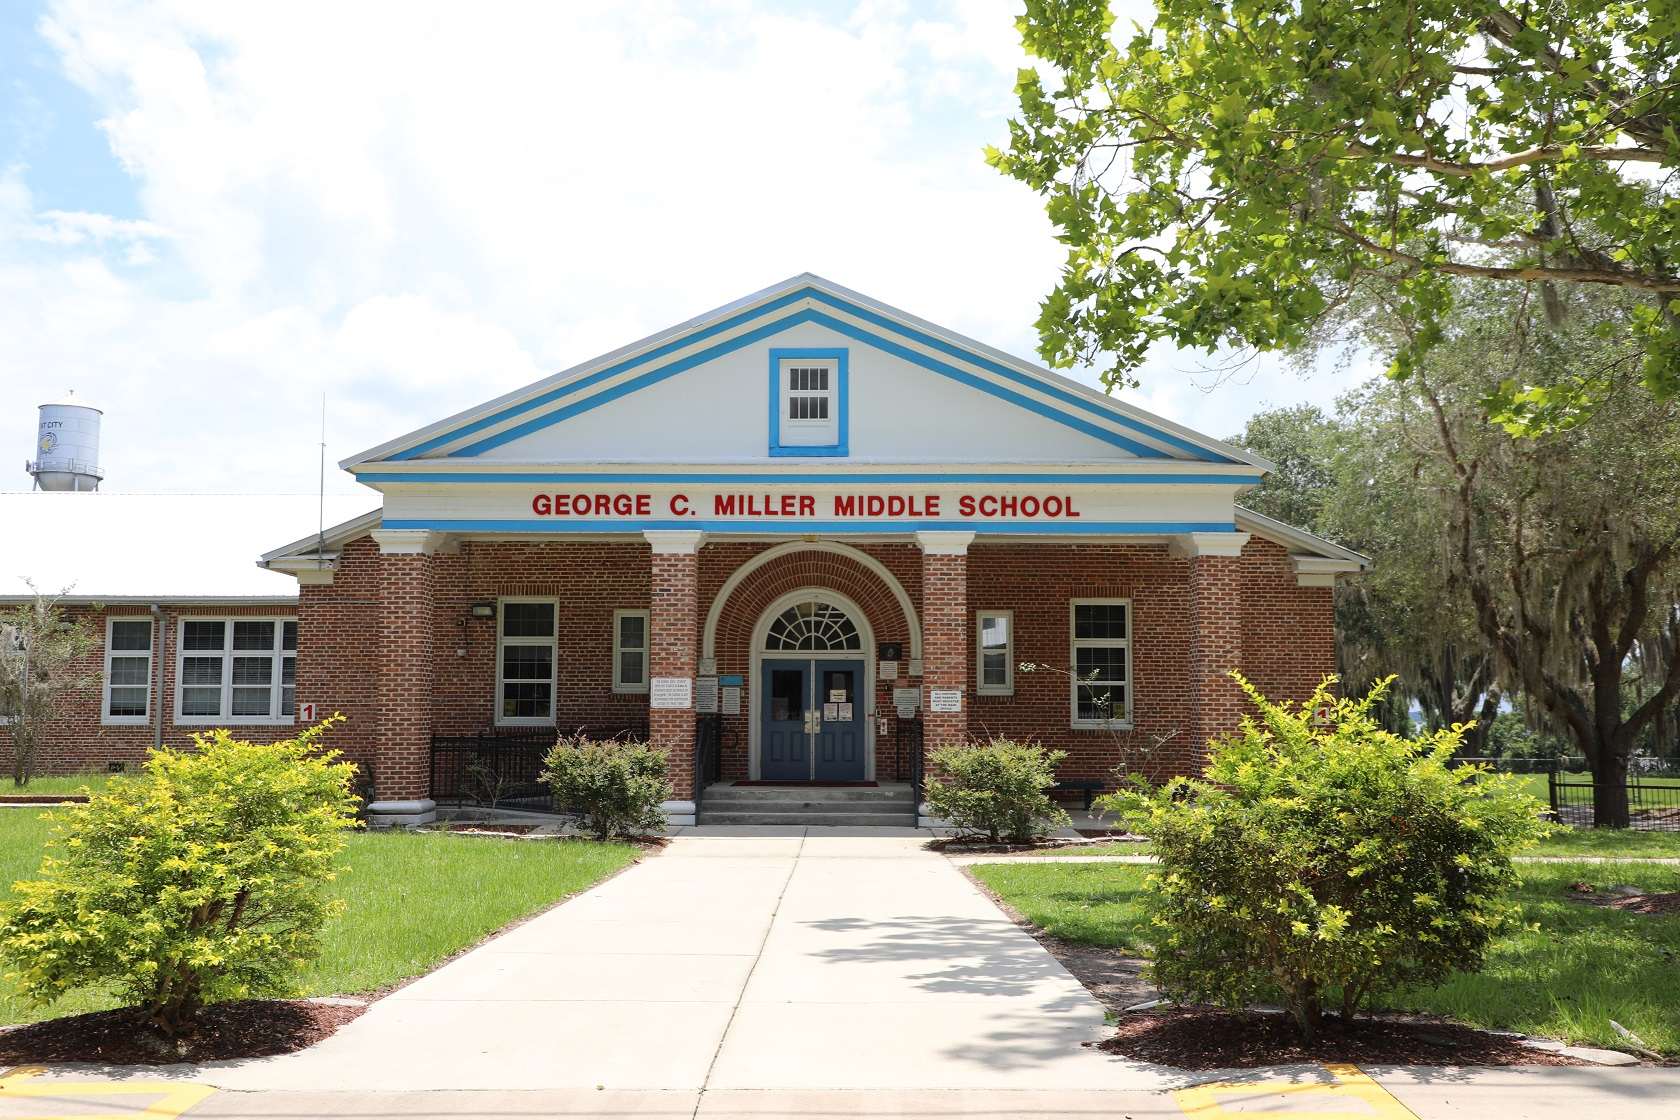 George C Miller Middle School